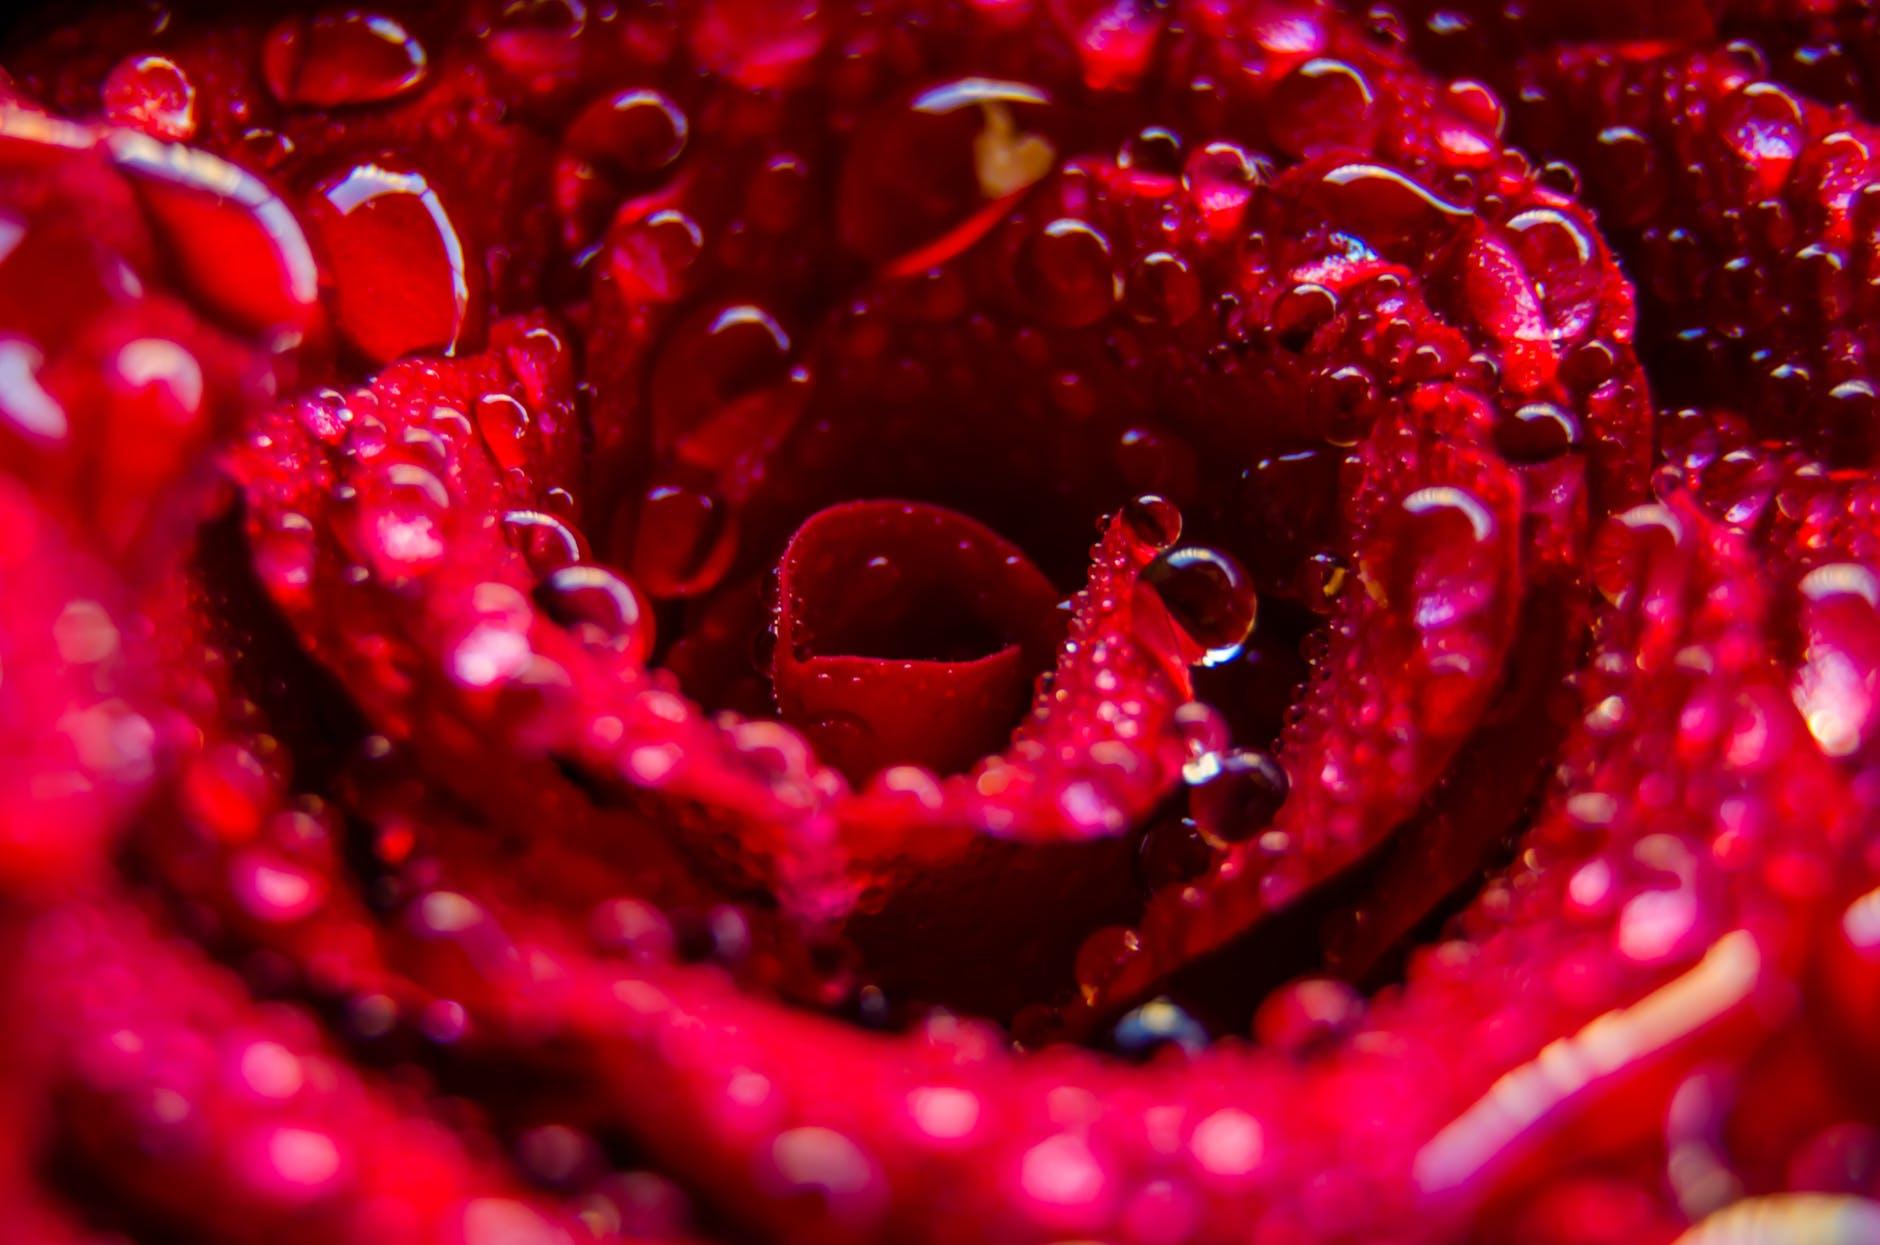 abstract art beautiful bloom